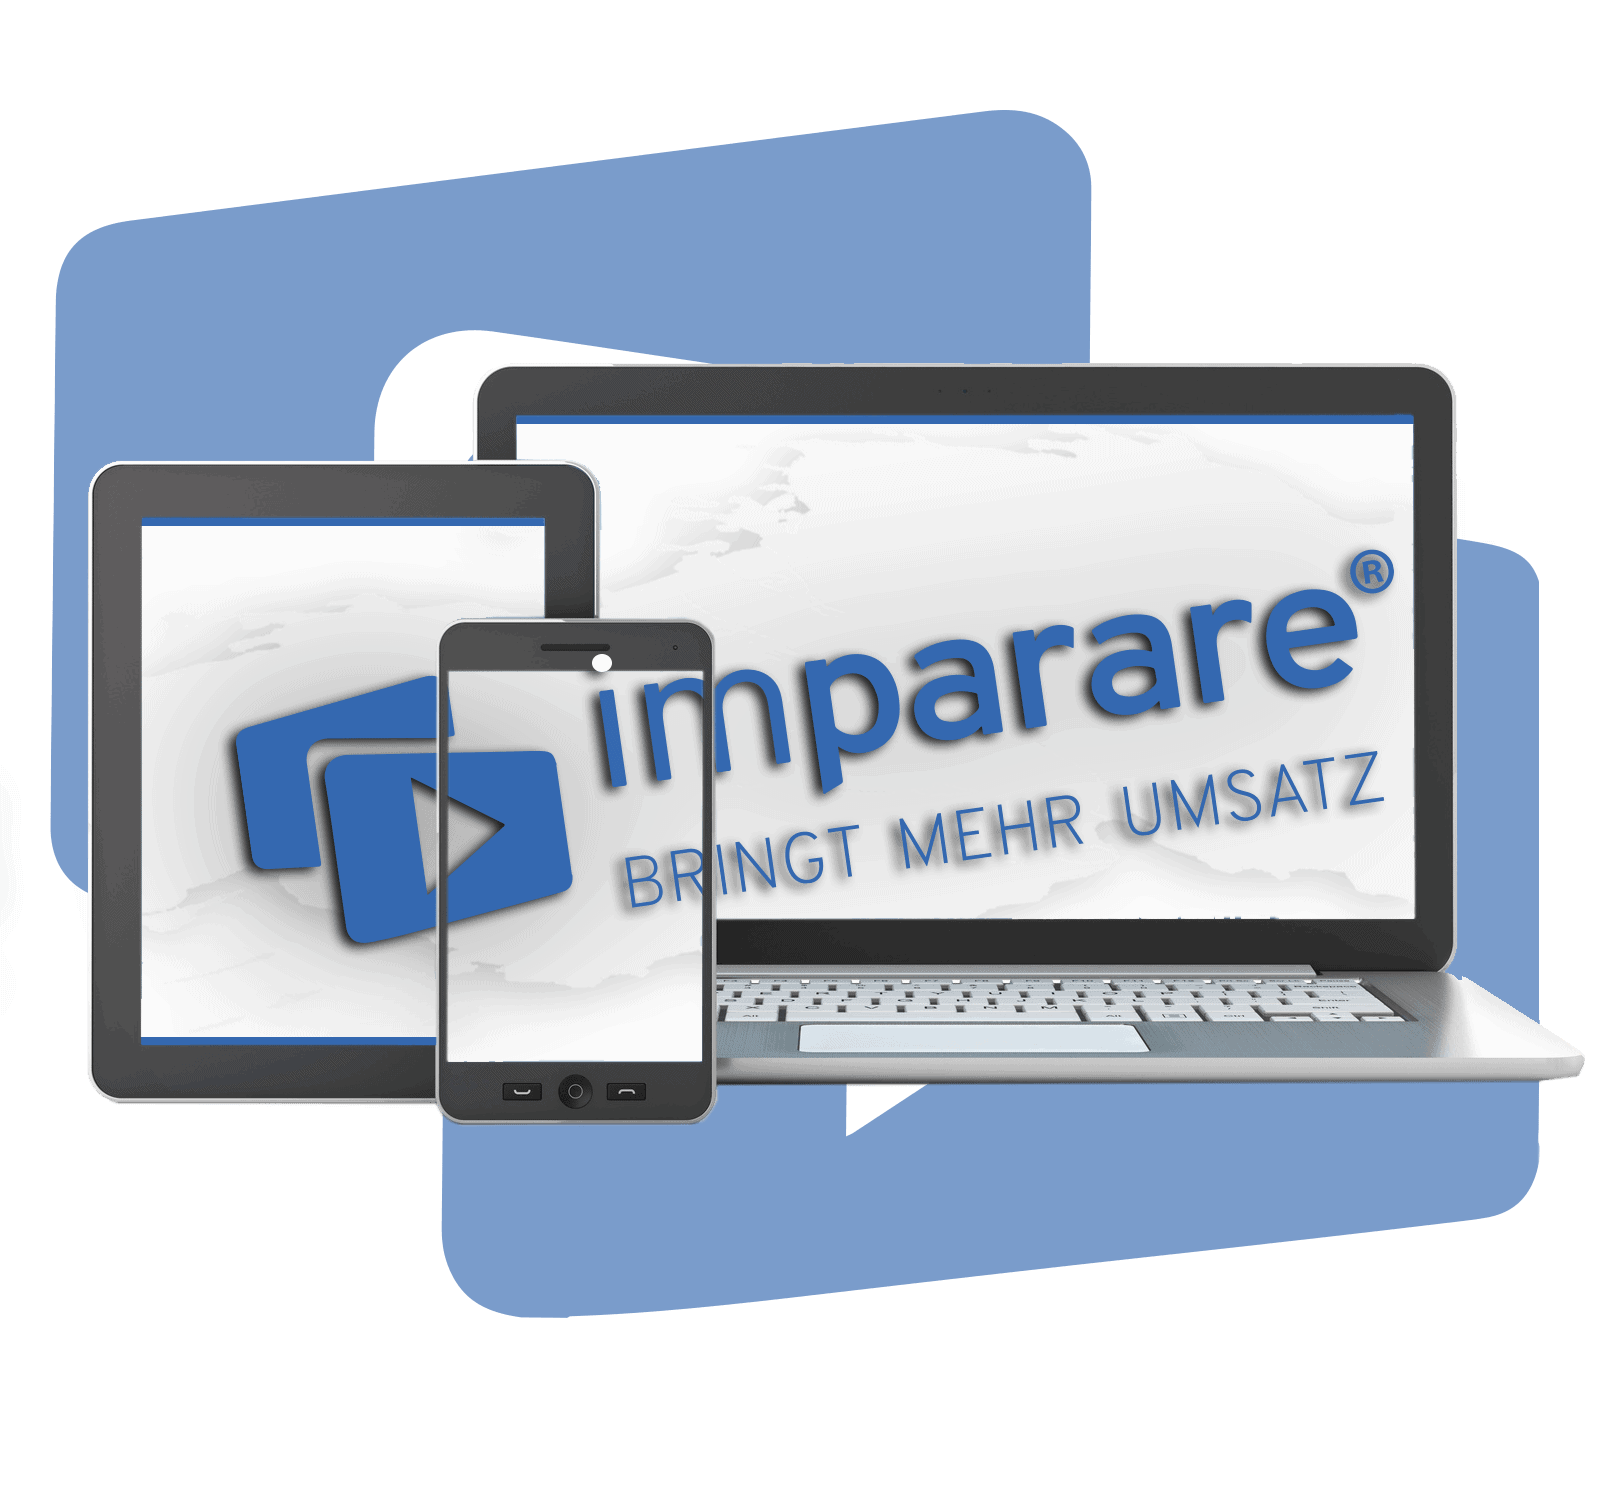 Imparare Webinar Tool